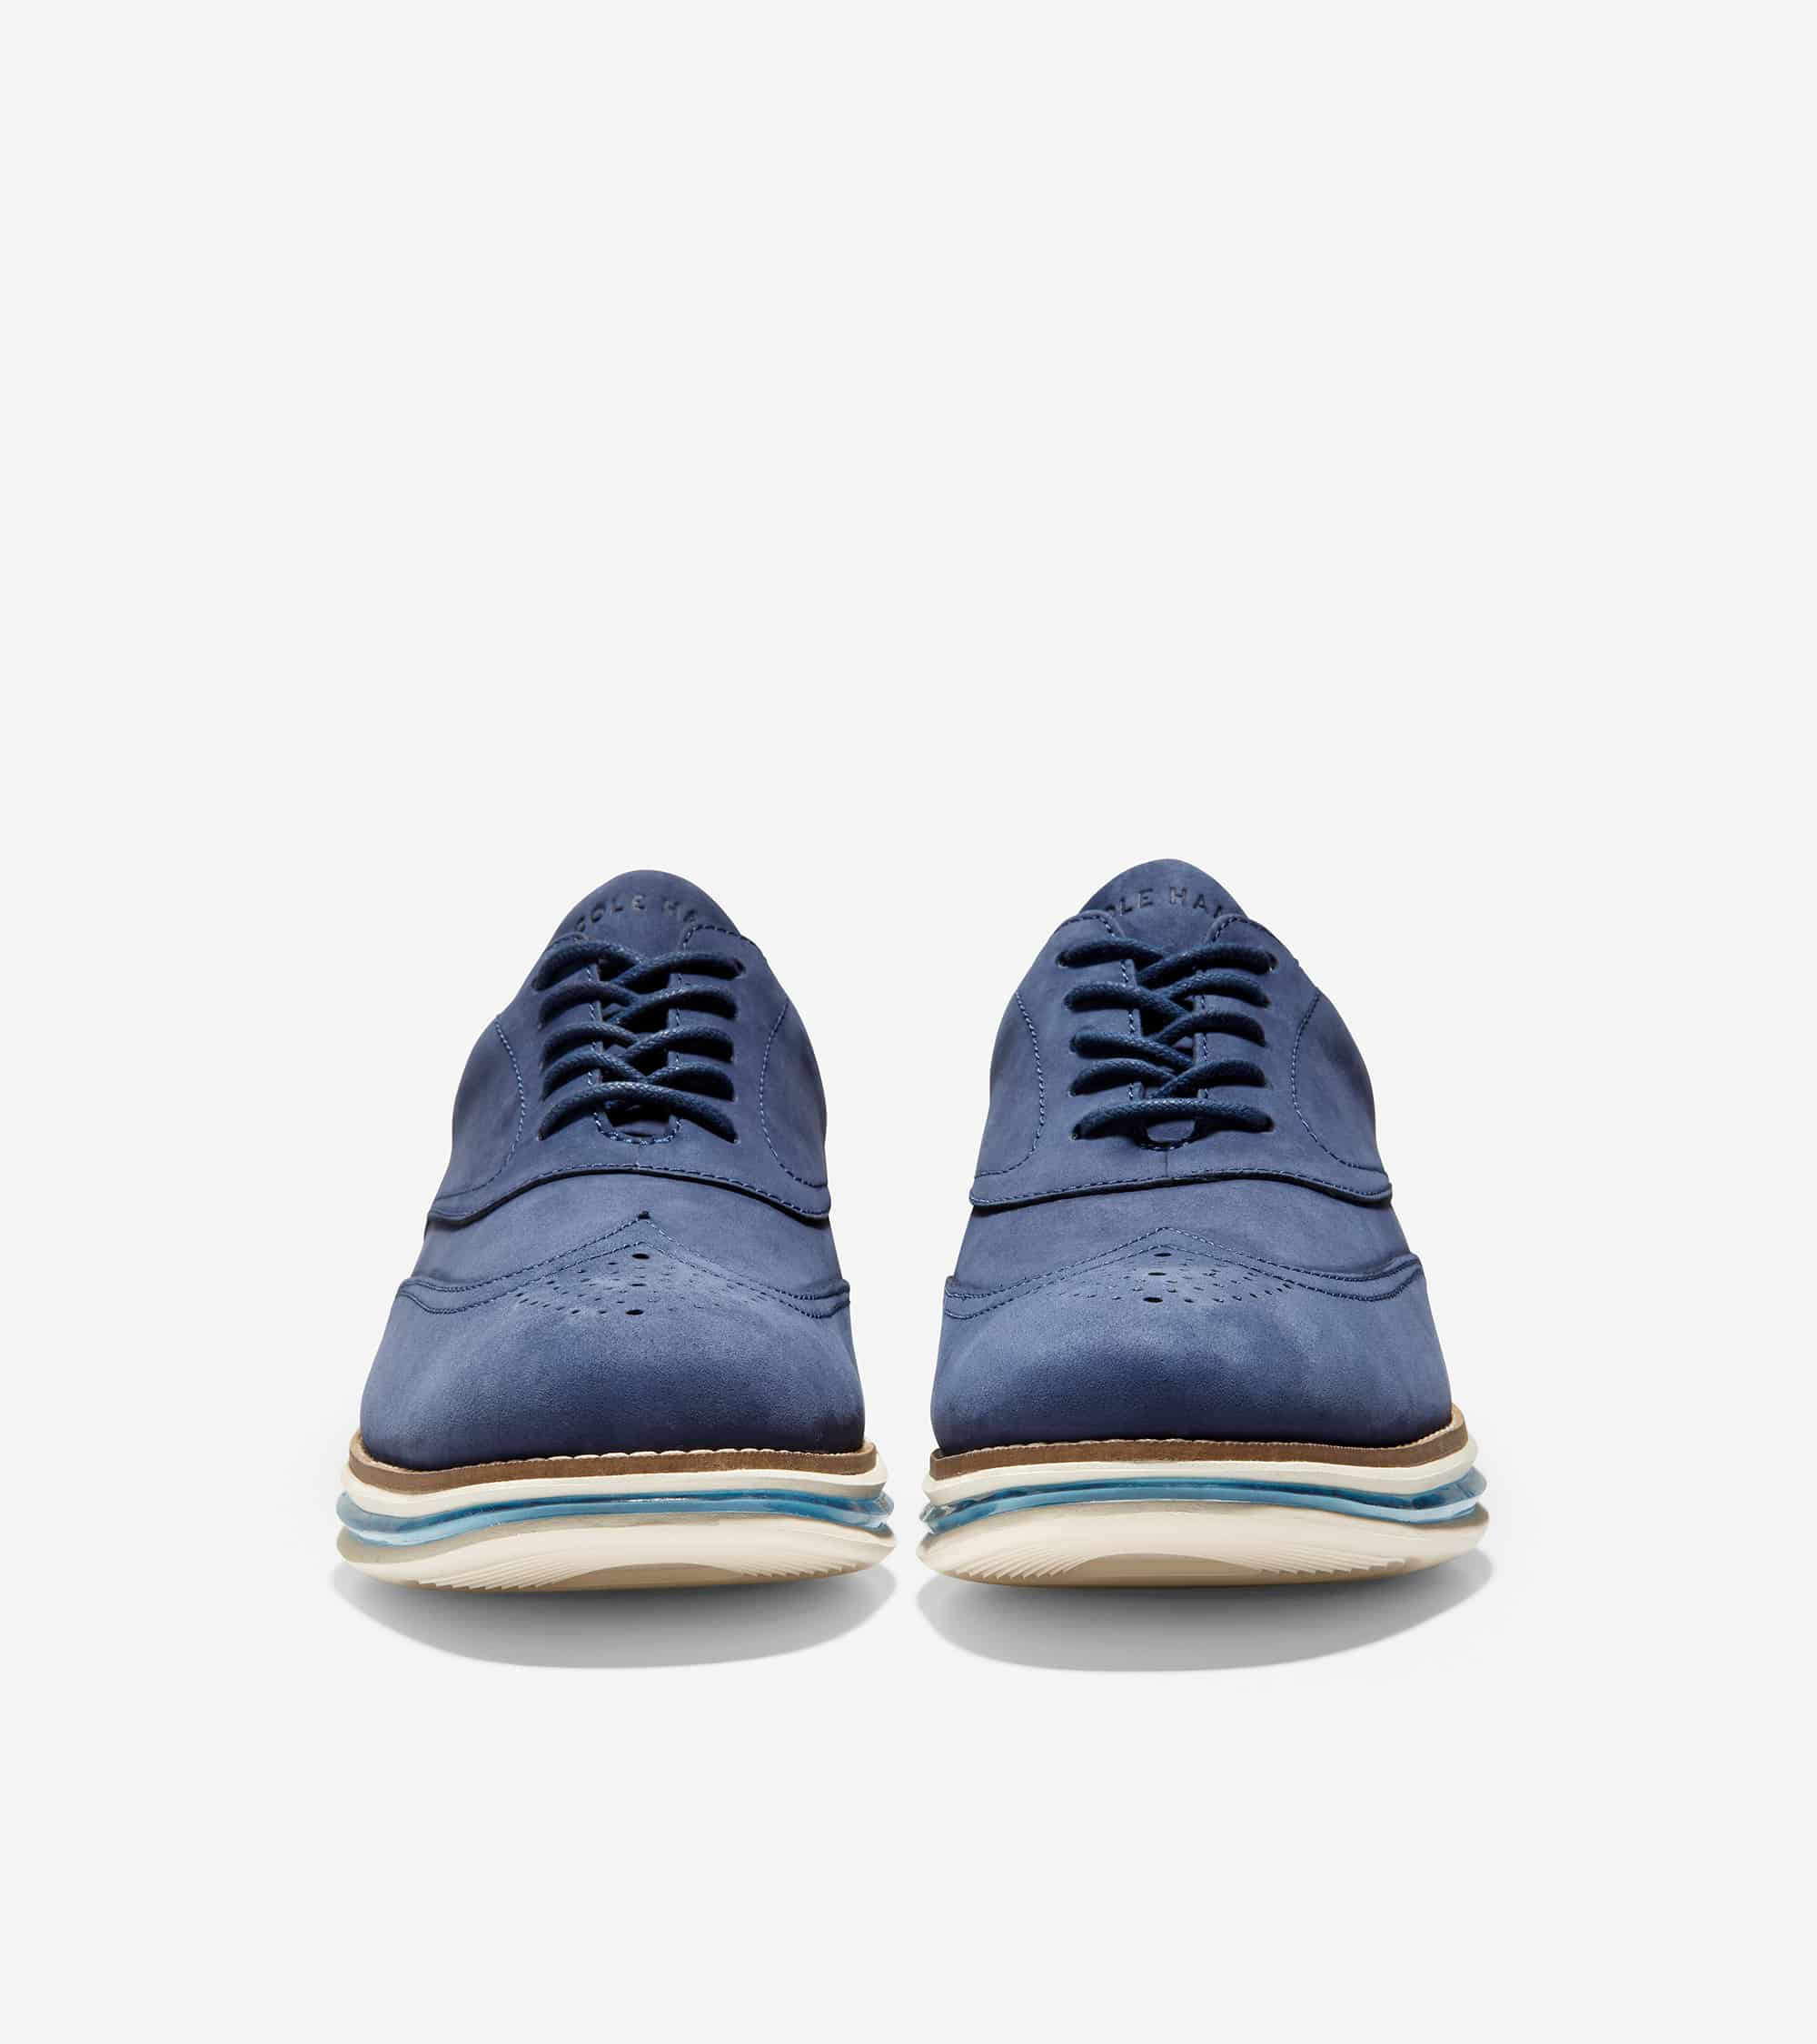 Cole Haan Øriginalgrand Cloudfeel Energy One Wgox Marine Blue/Ivory-Directoire Blue